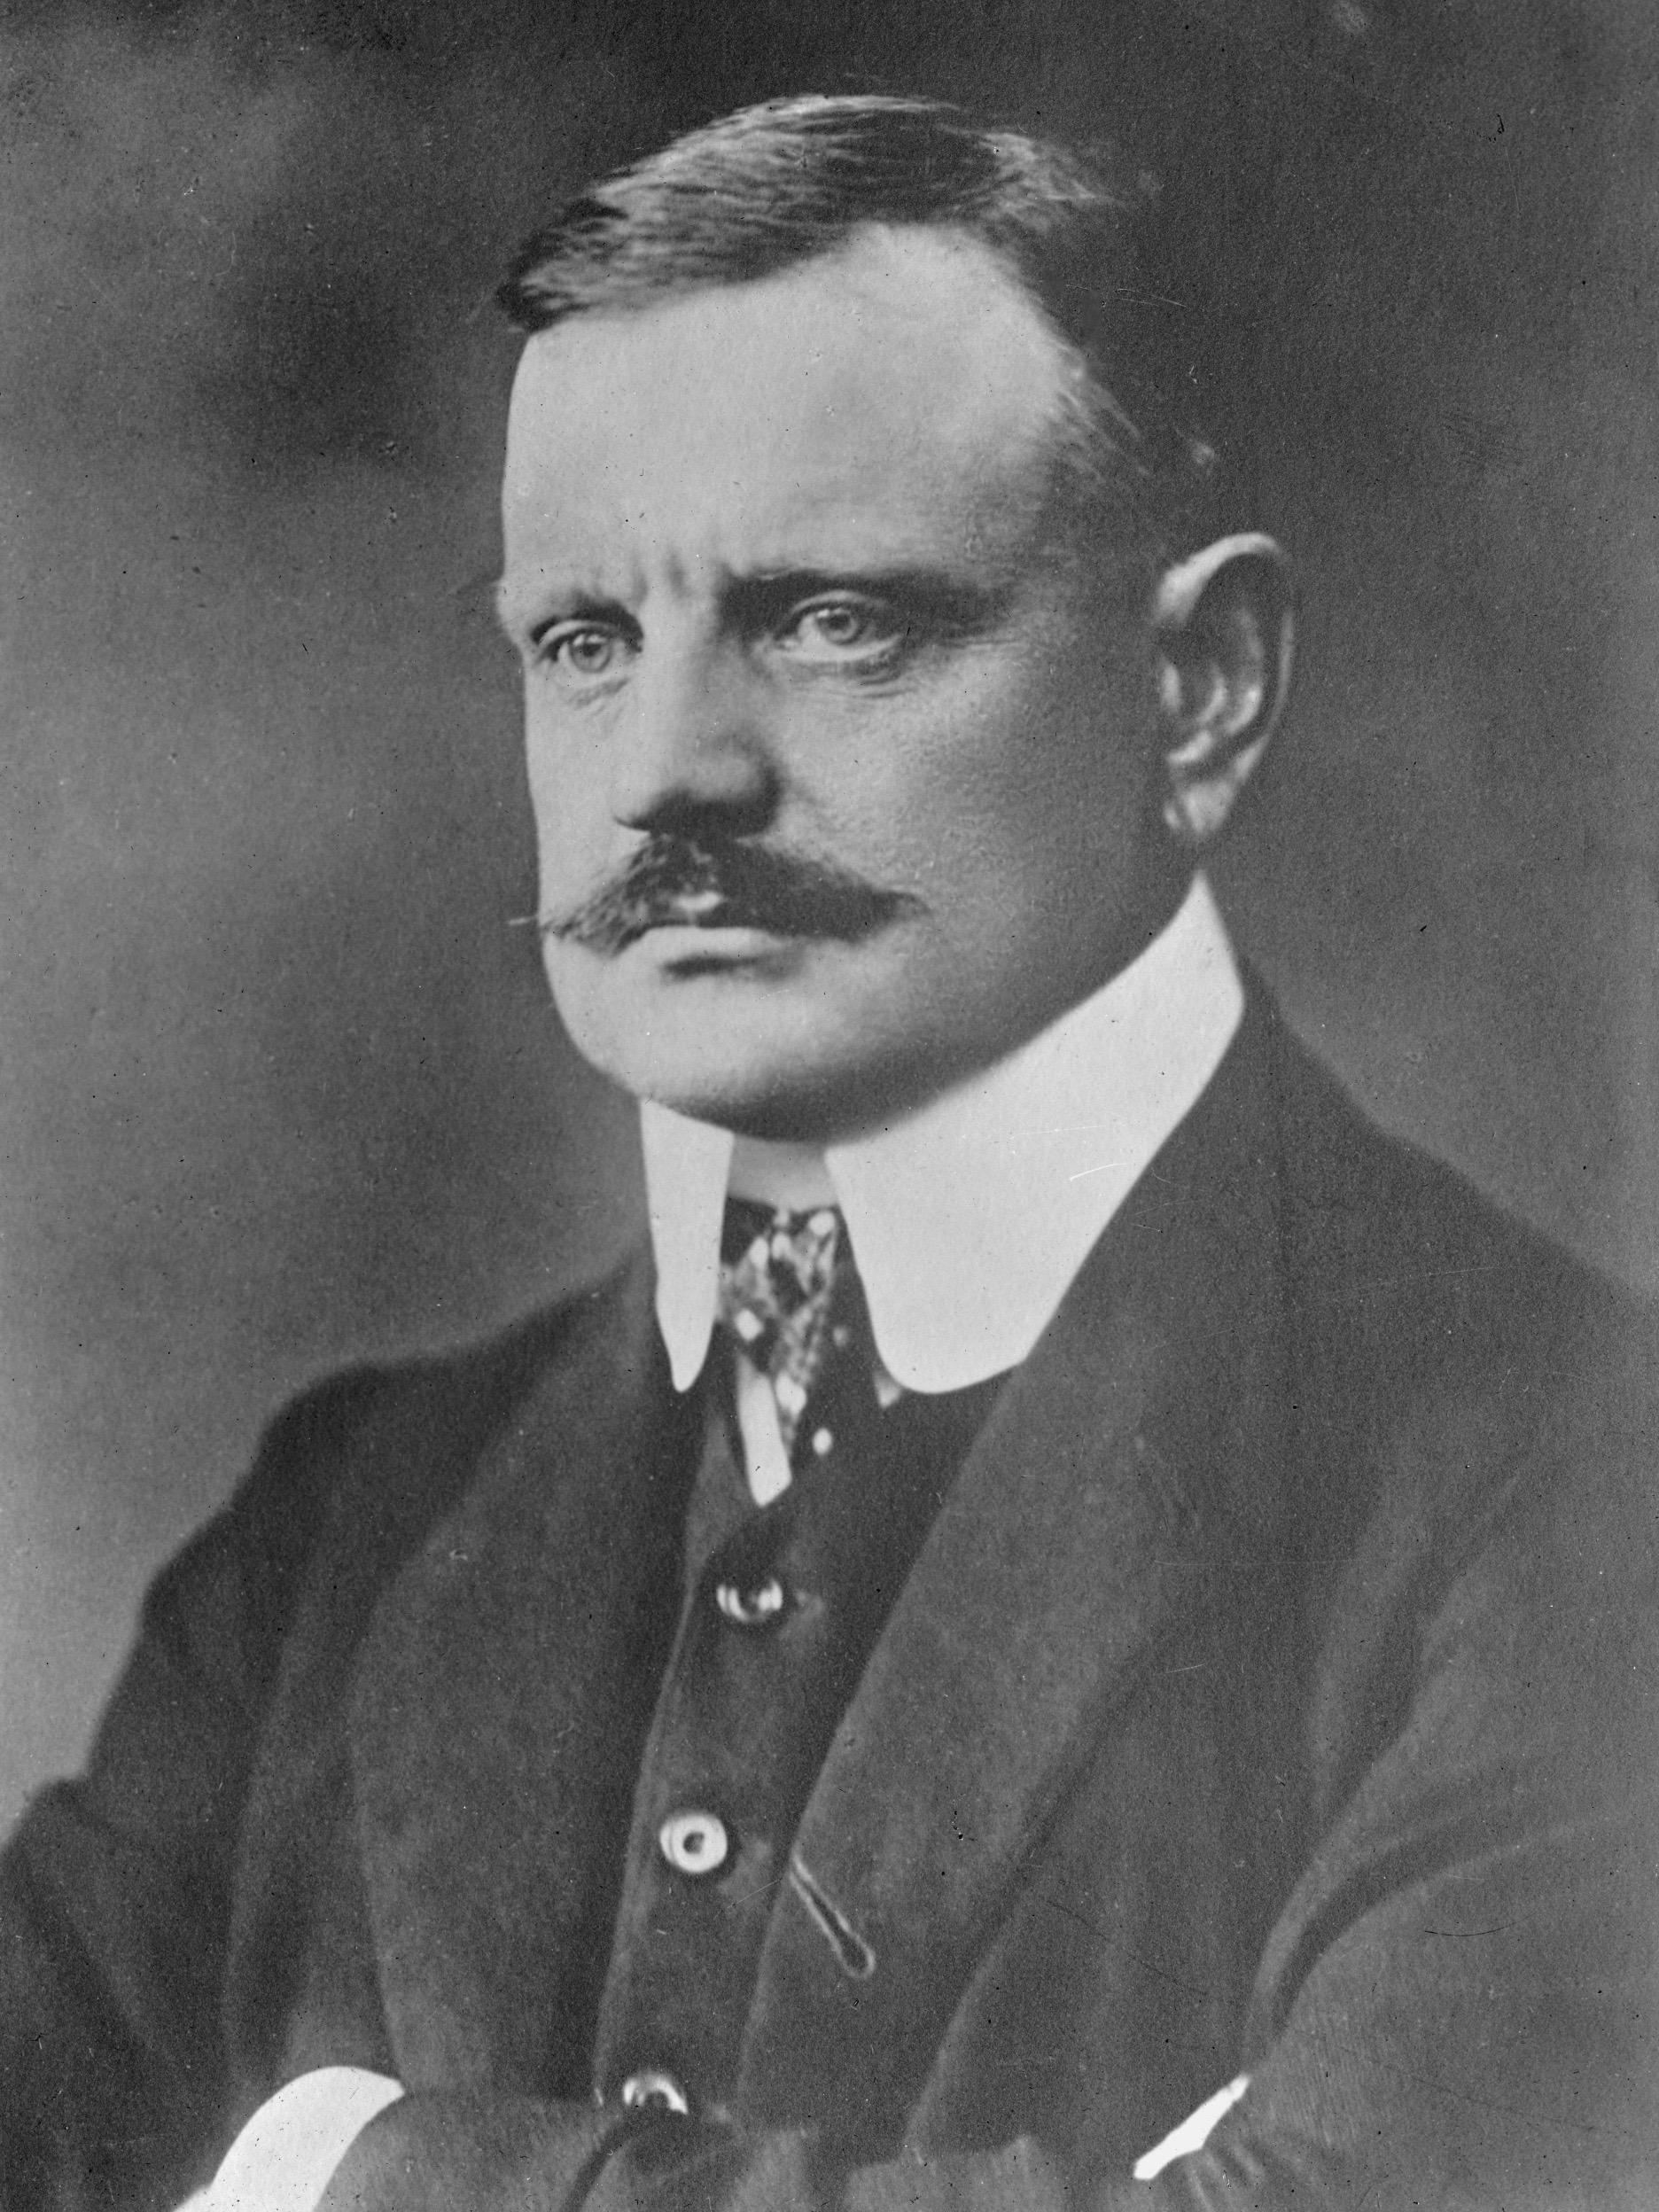 Jean Sibelius a Freemason